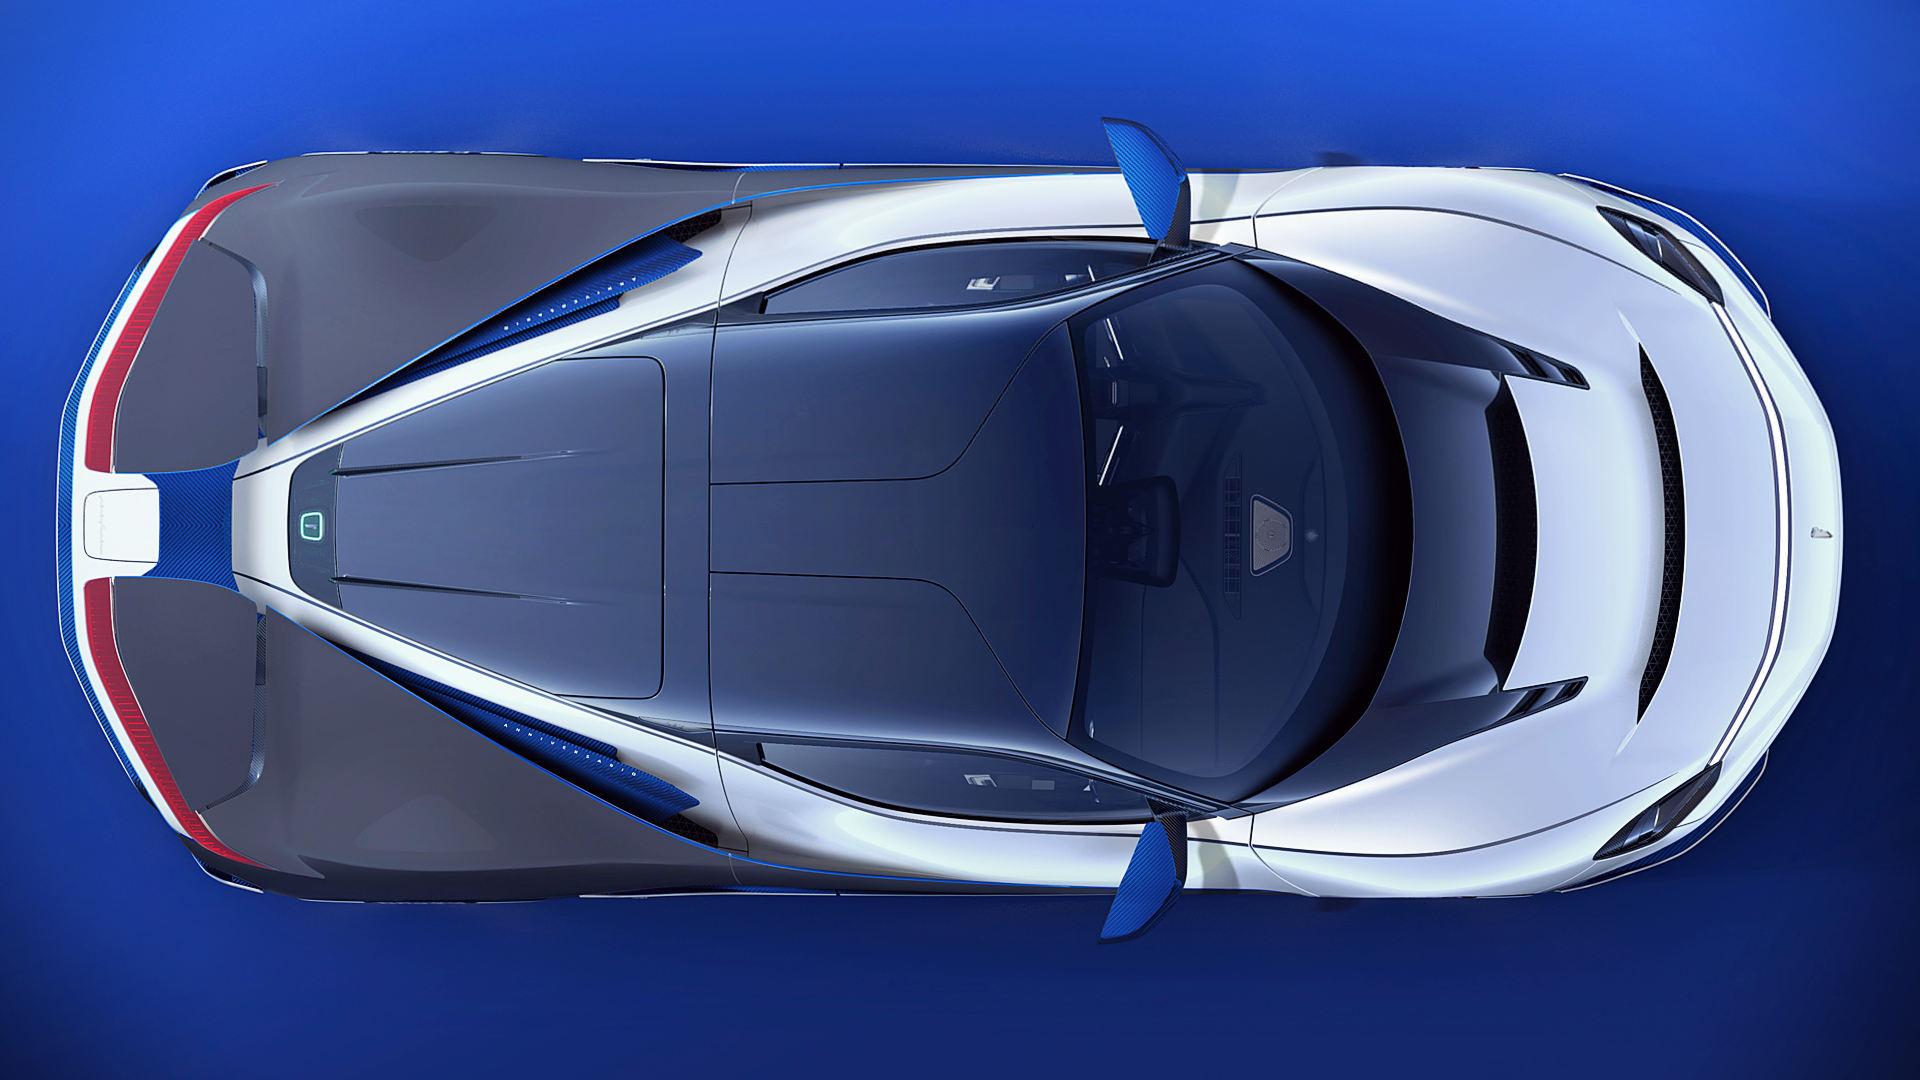 Pininfarina Battista Car 2021 Wallpaper